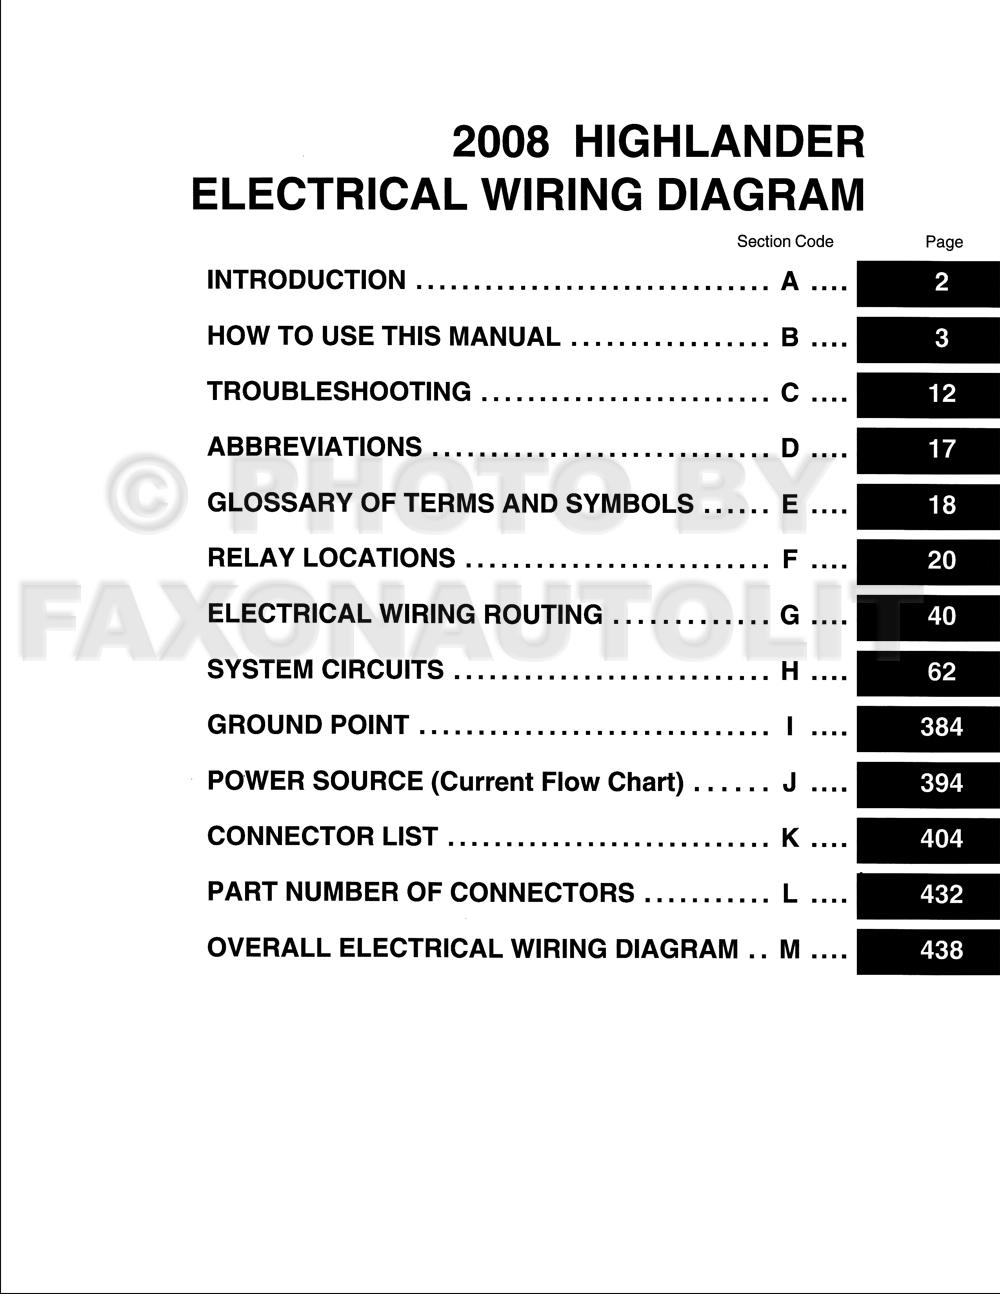 medium resolution of 2008 toyota highlander wiring diagram manual original 2006 toyota highlander wiring diagrams pdf 2008 toyota highlander wiring diagram